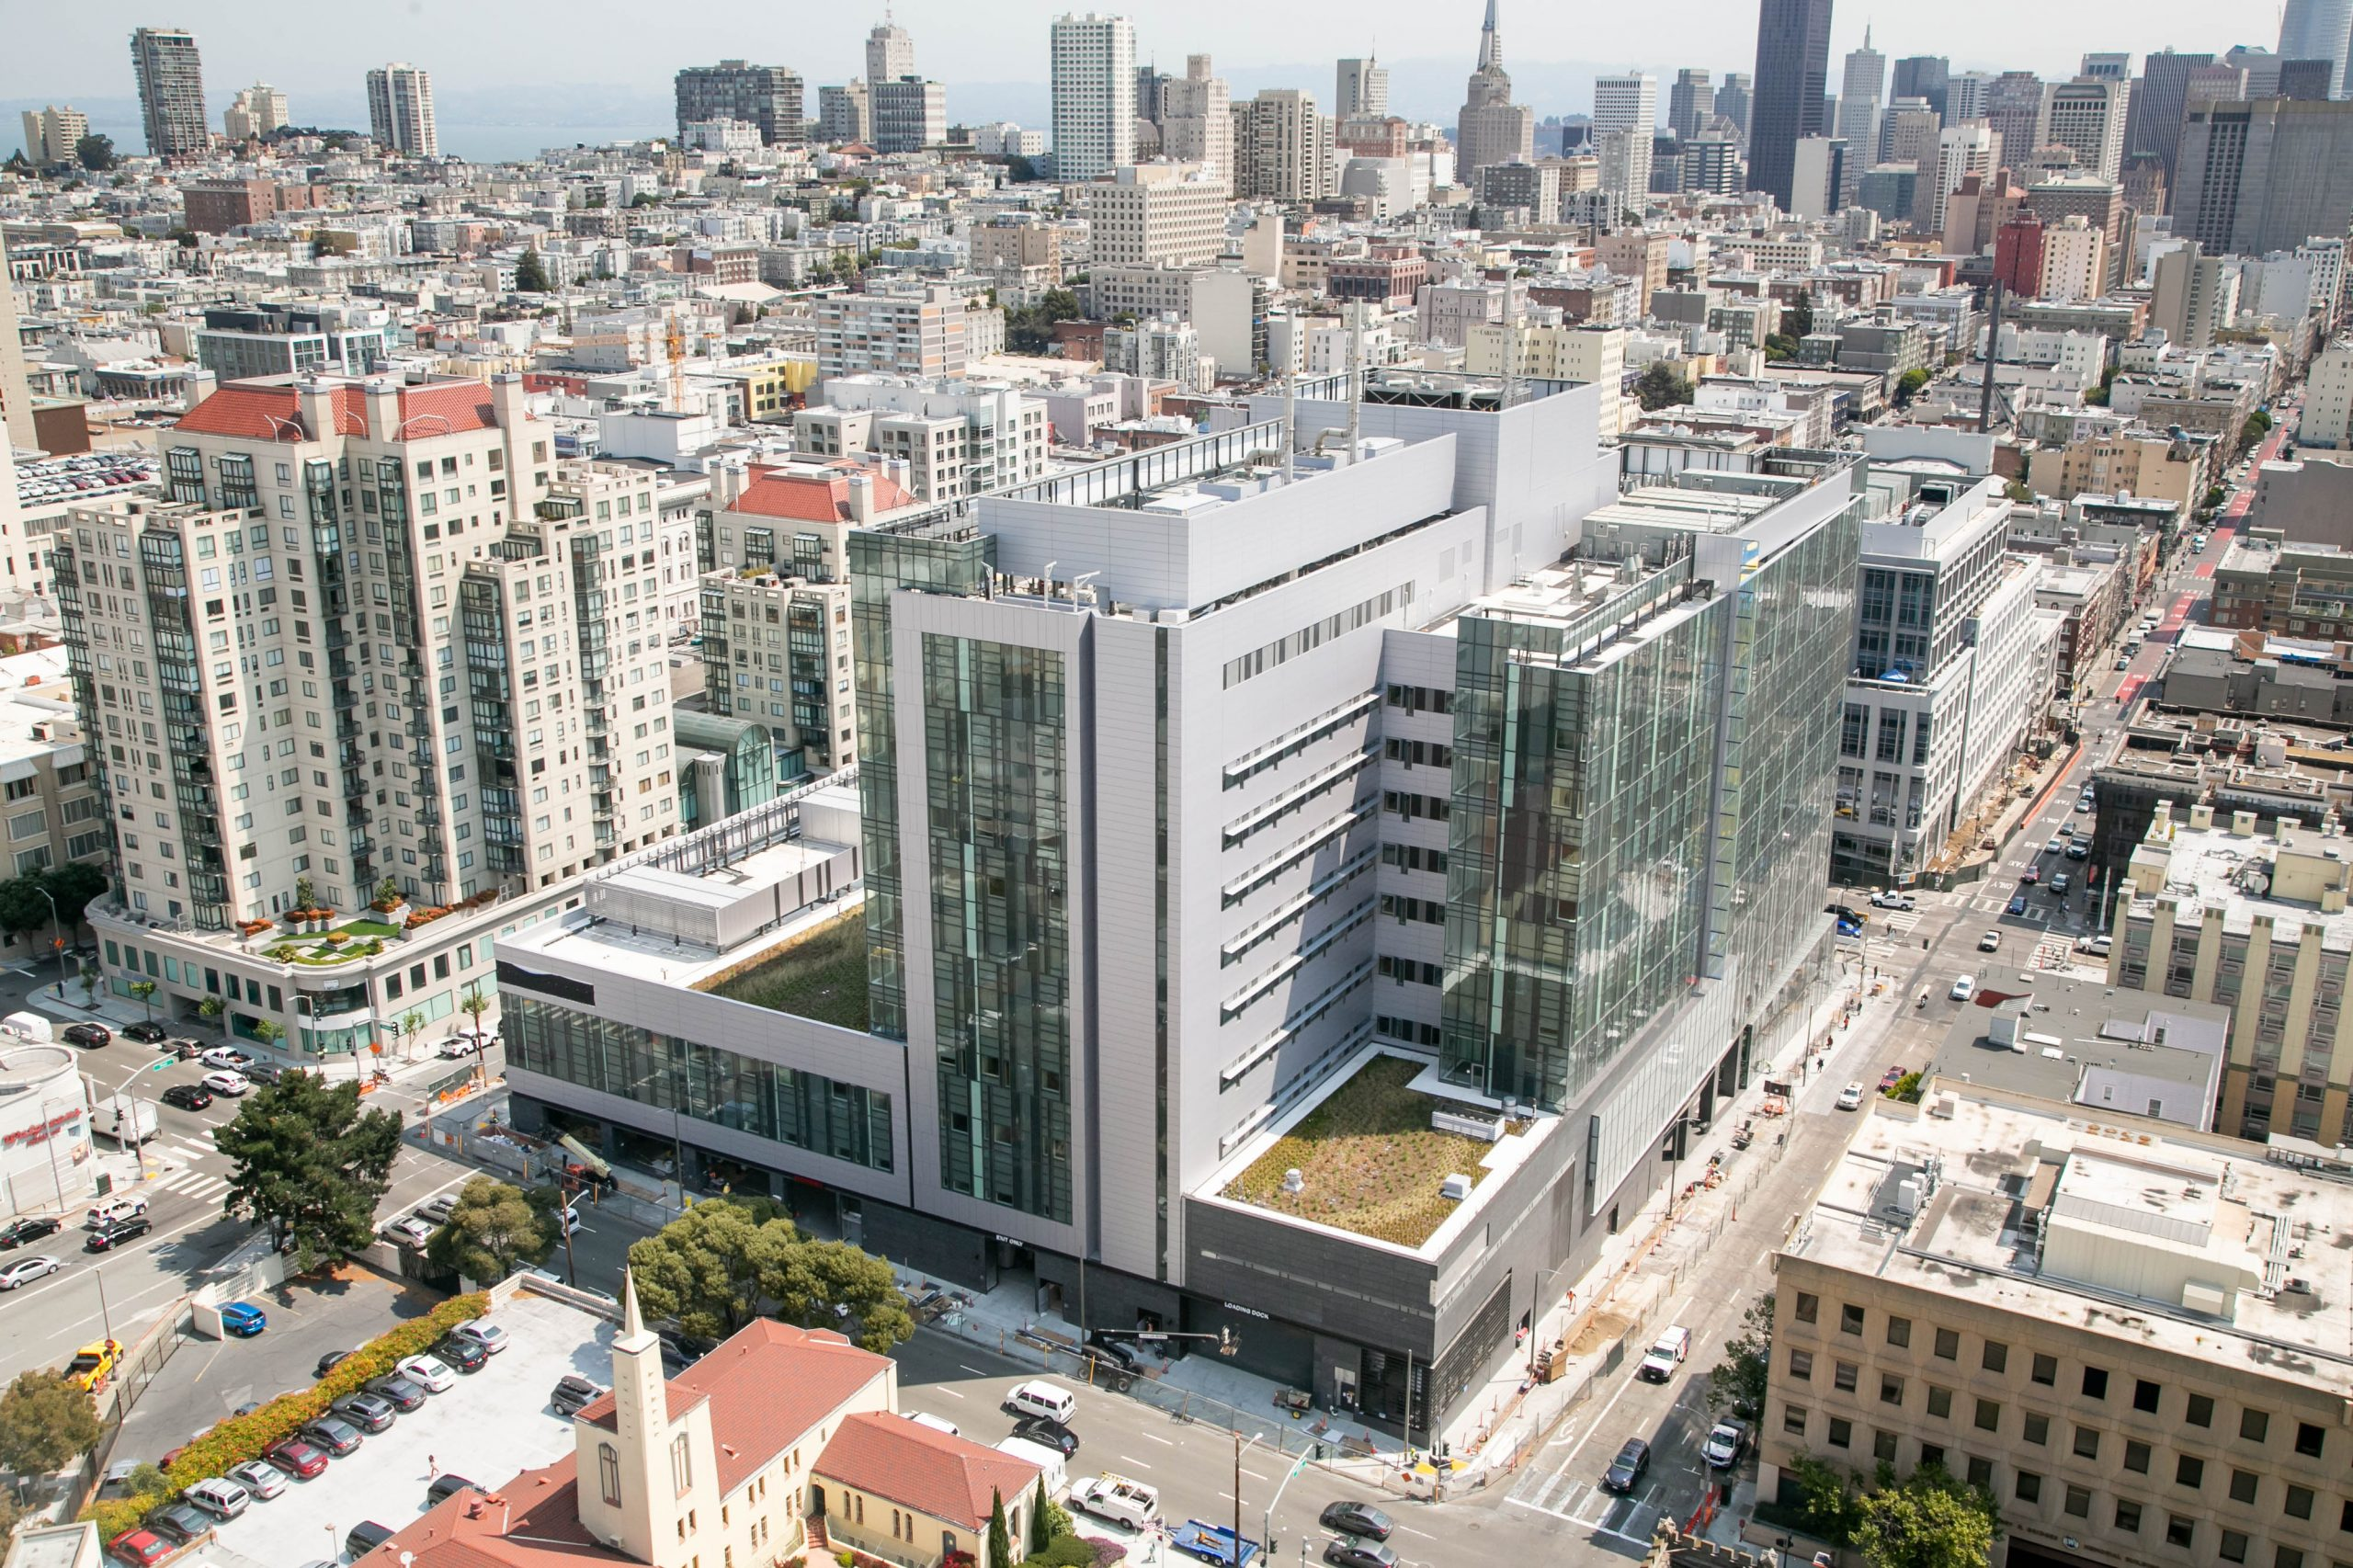 Sutter's CPMC Van Ness Campus Hospital